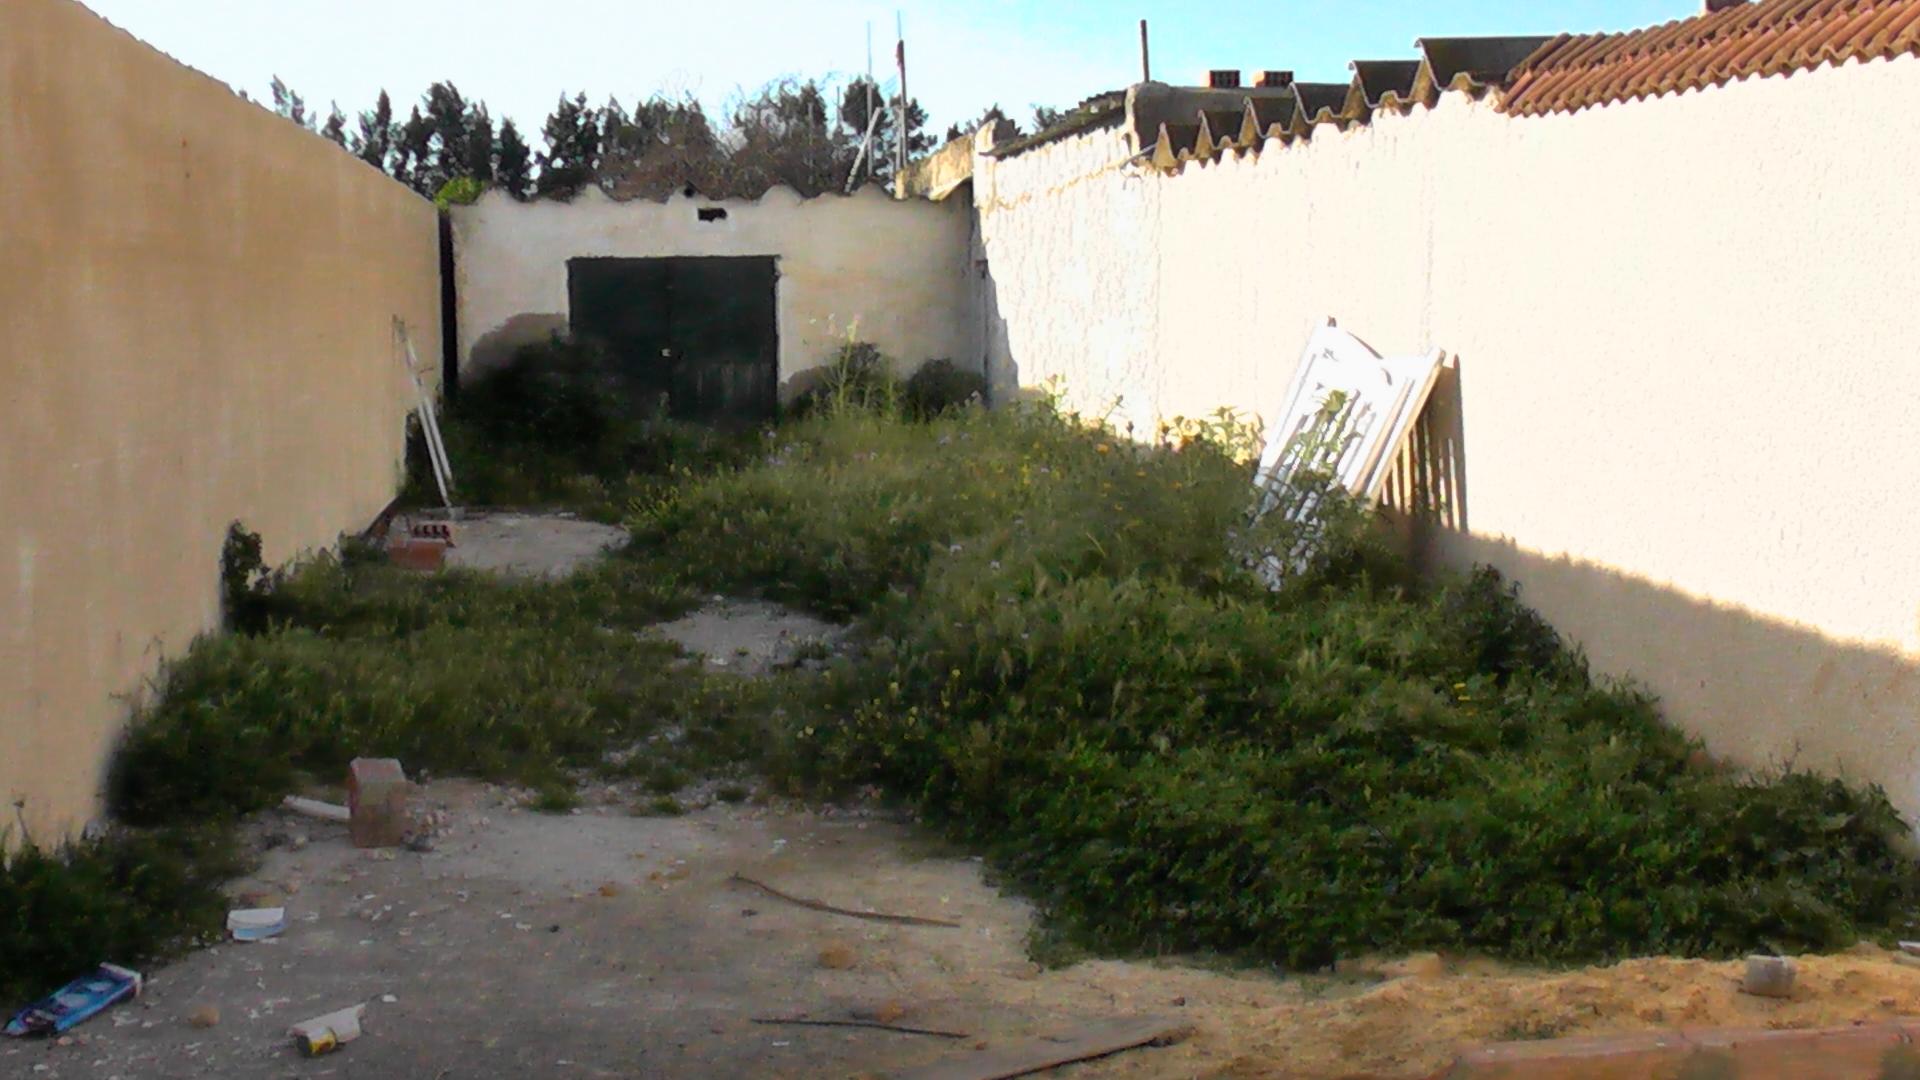 Vente achat terrain en tunisie vendre et acheter terrains for Acheter maison tunisie